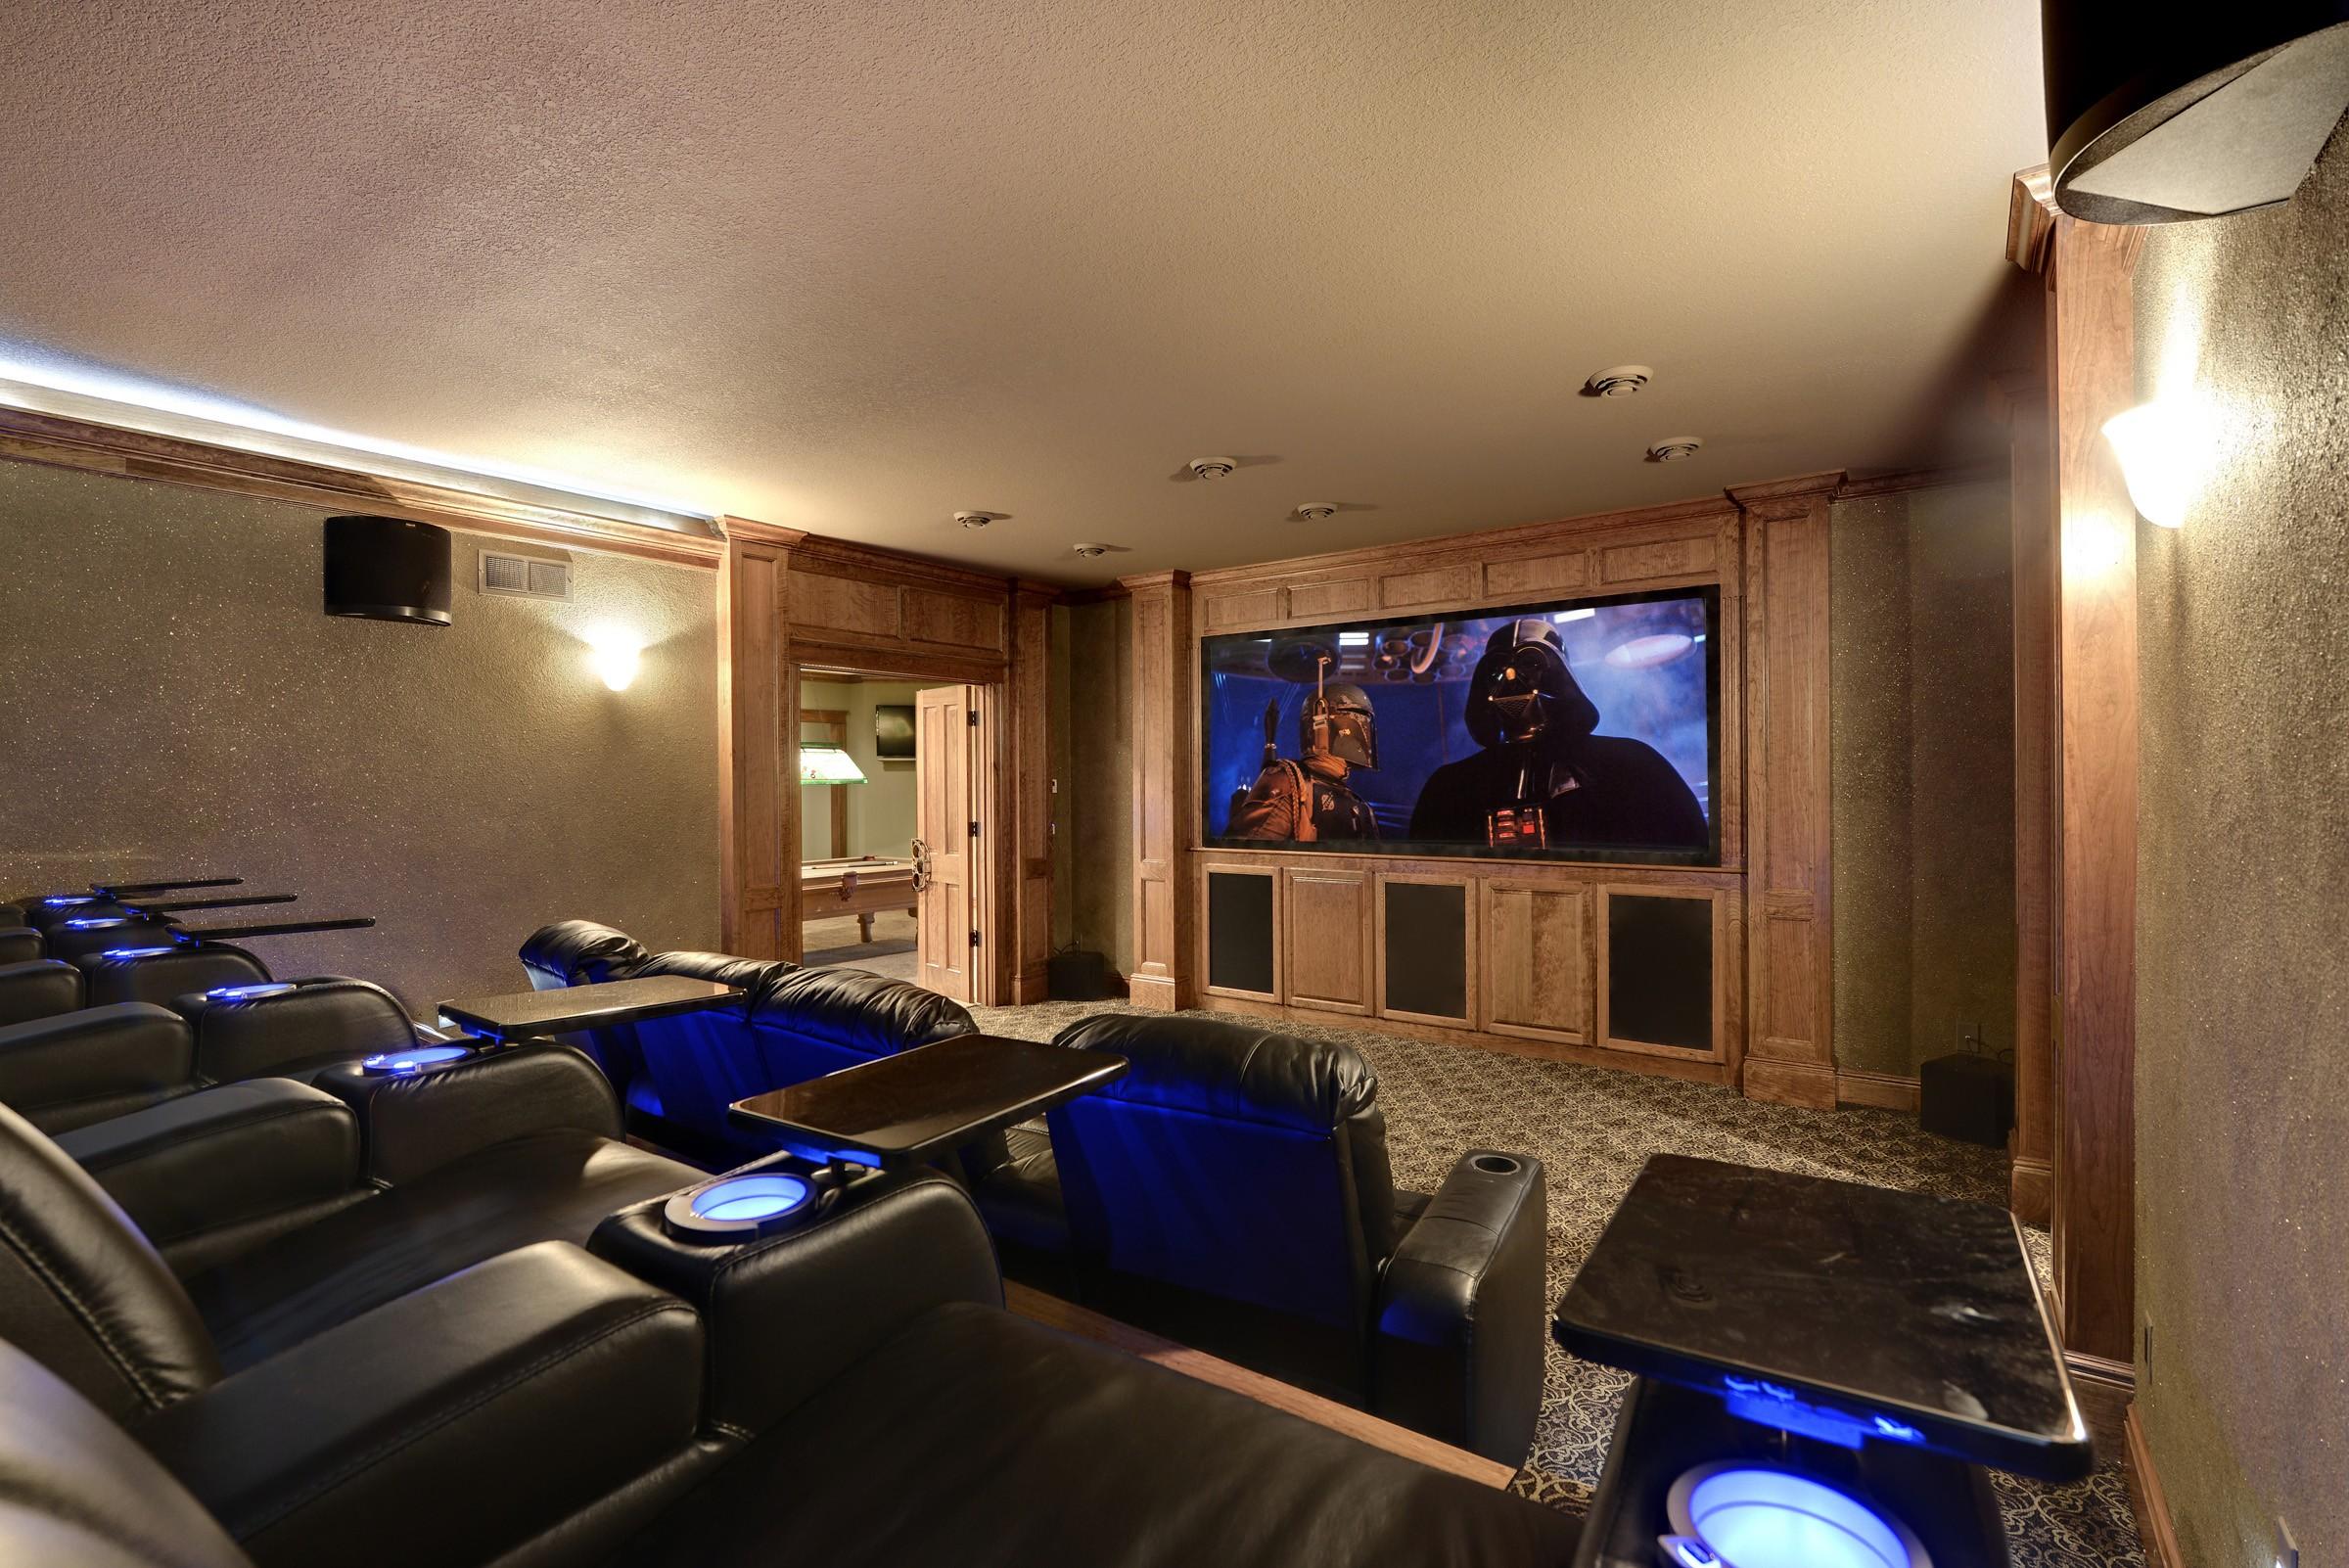 SLH Home Systems - Home Theater Installation - Minneapolis; St. Paul; Minnetonka; Wayzata; White Bear Lake; Minnesota